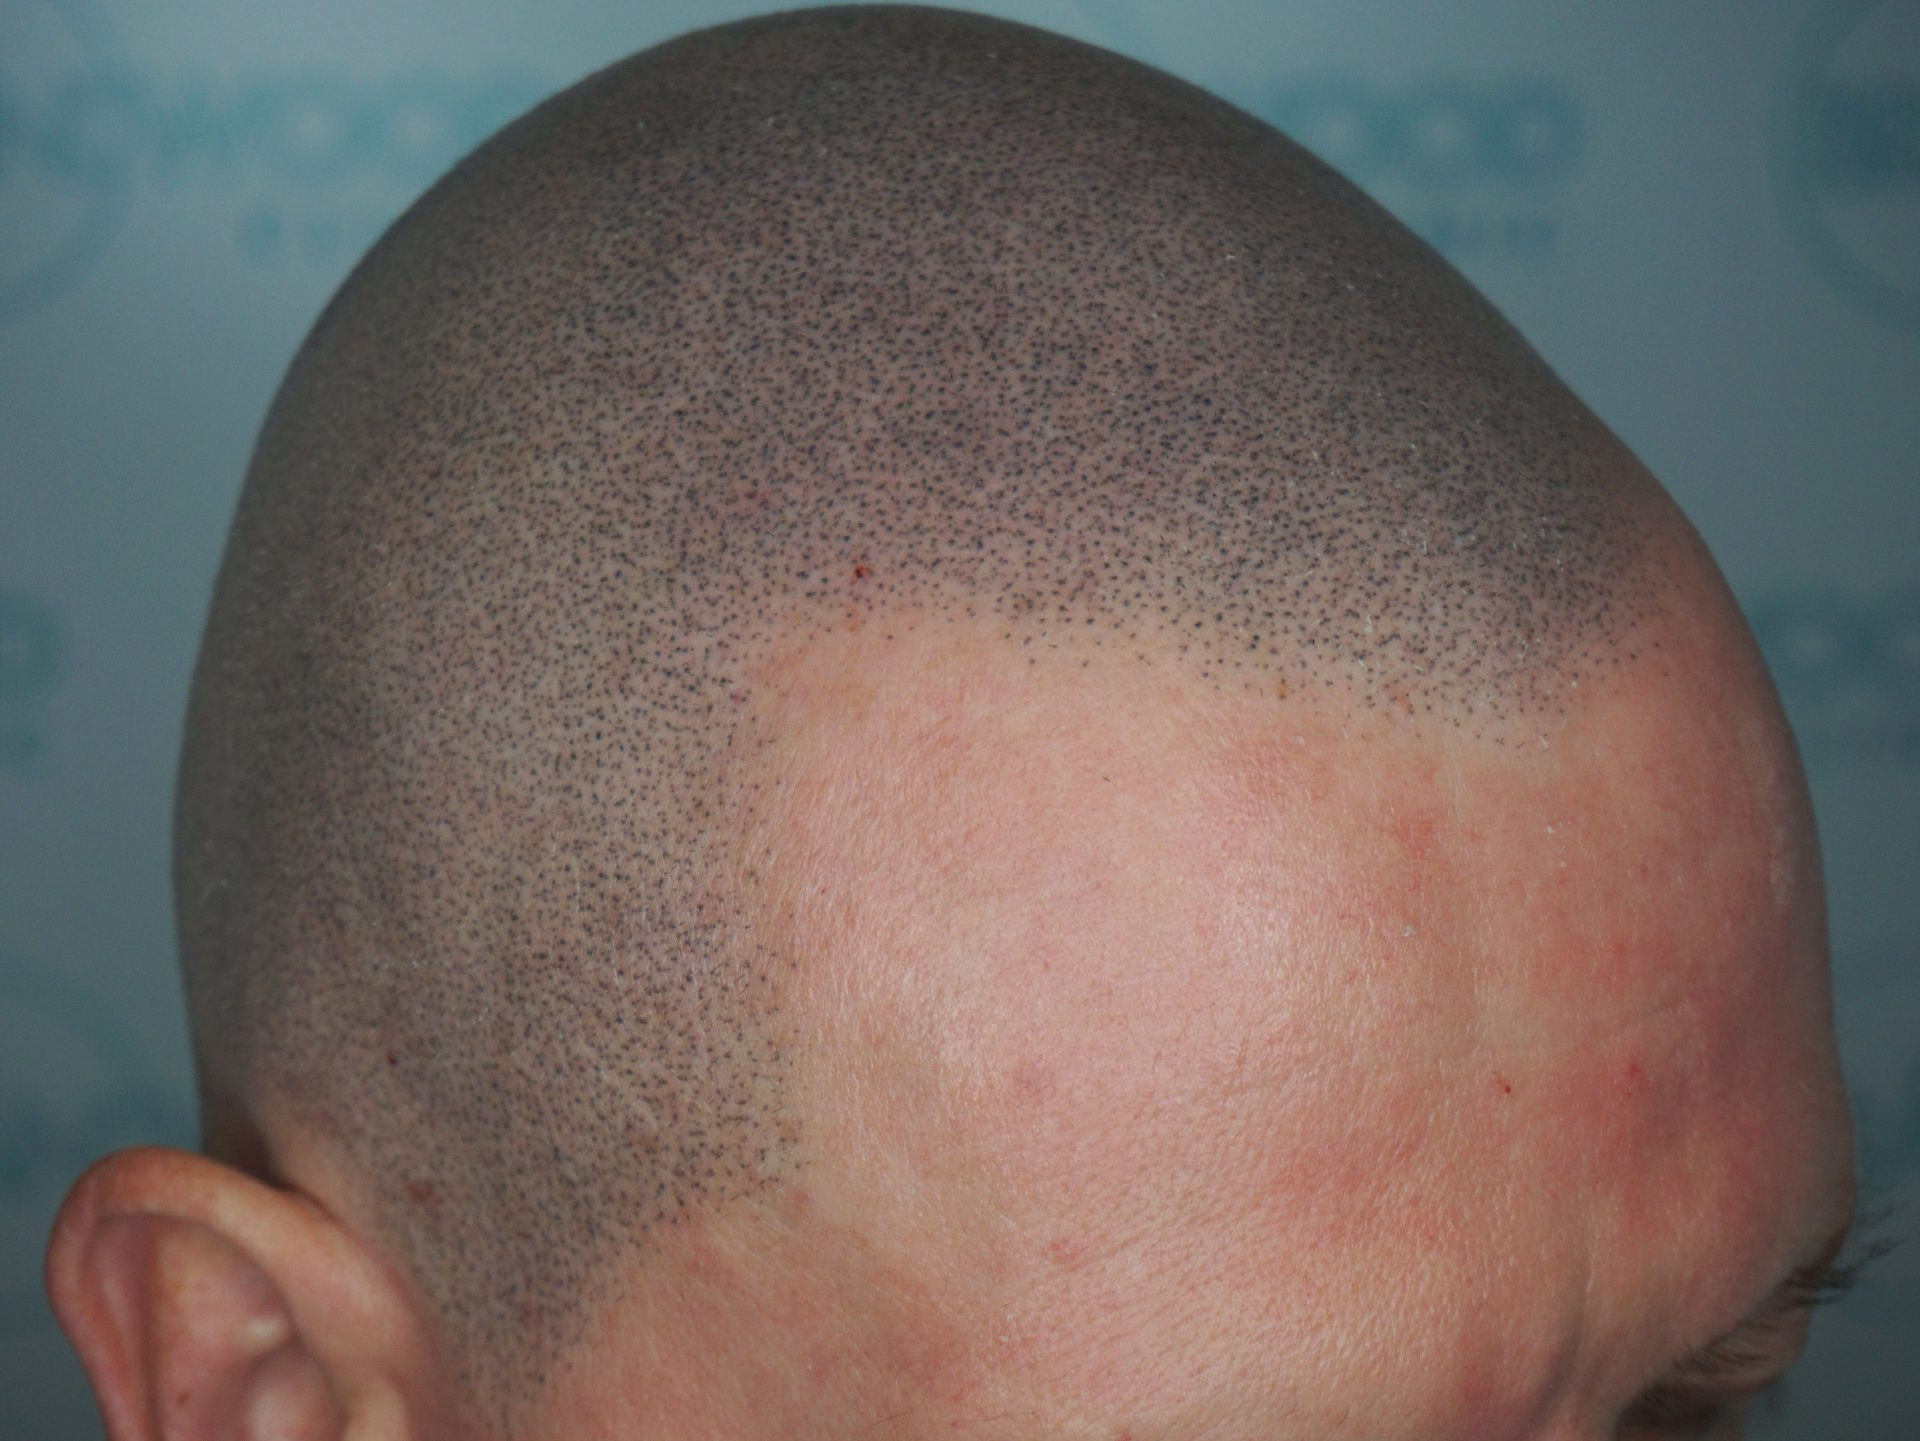 Alopecia: After